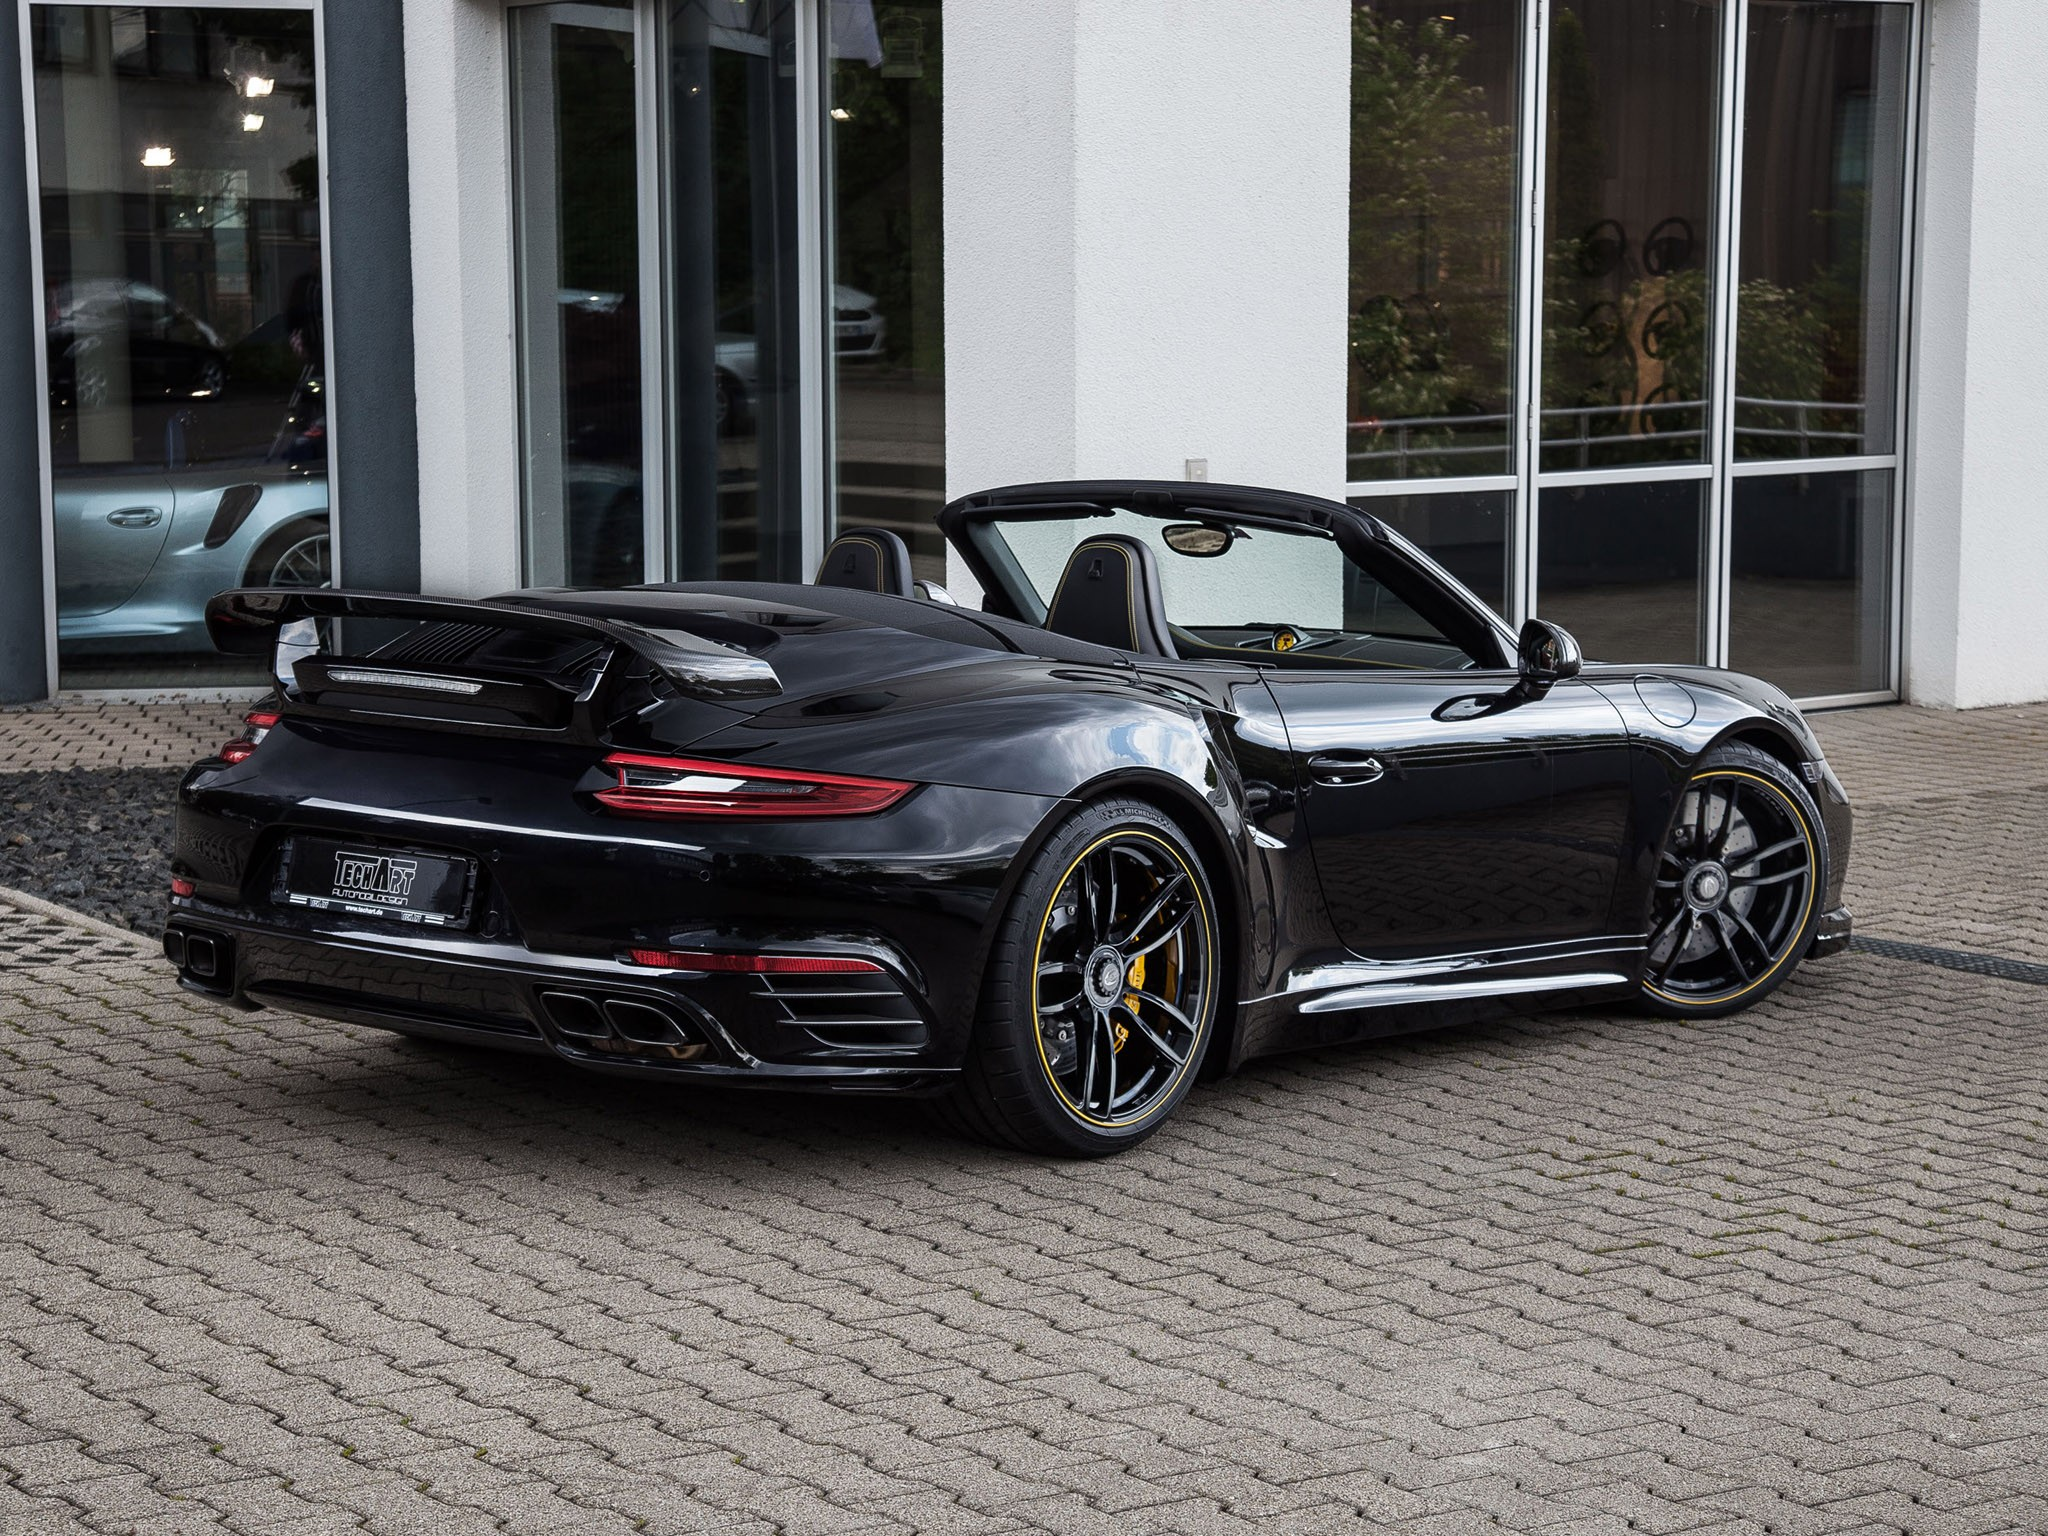 2016 Techart Porsche 911 Turbo Cabriolet 991